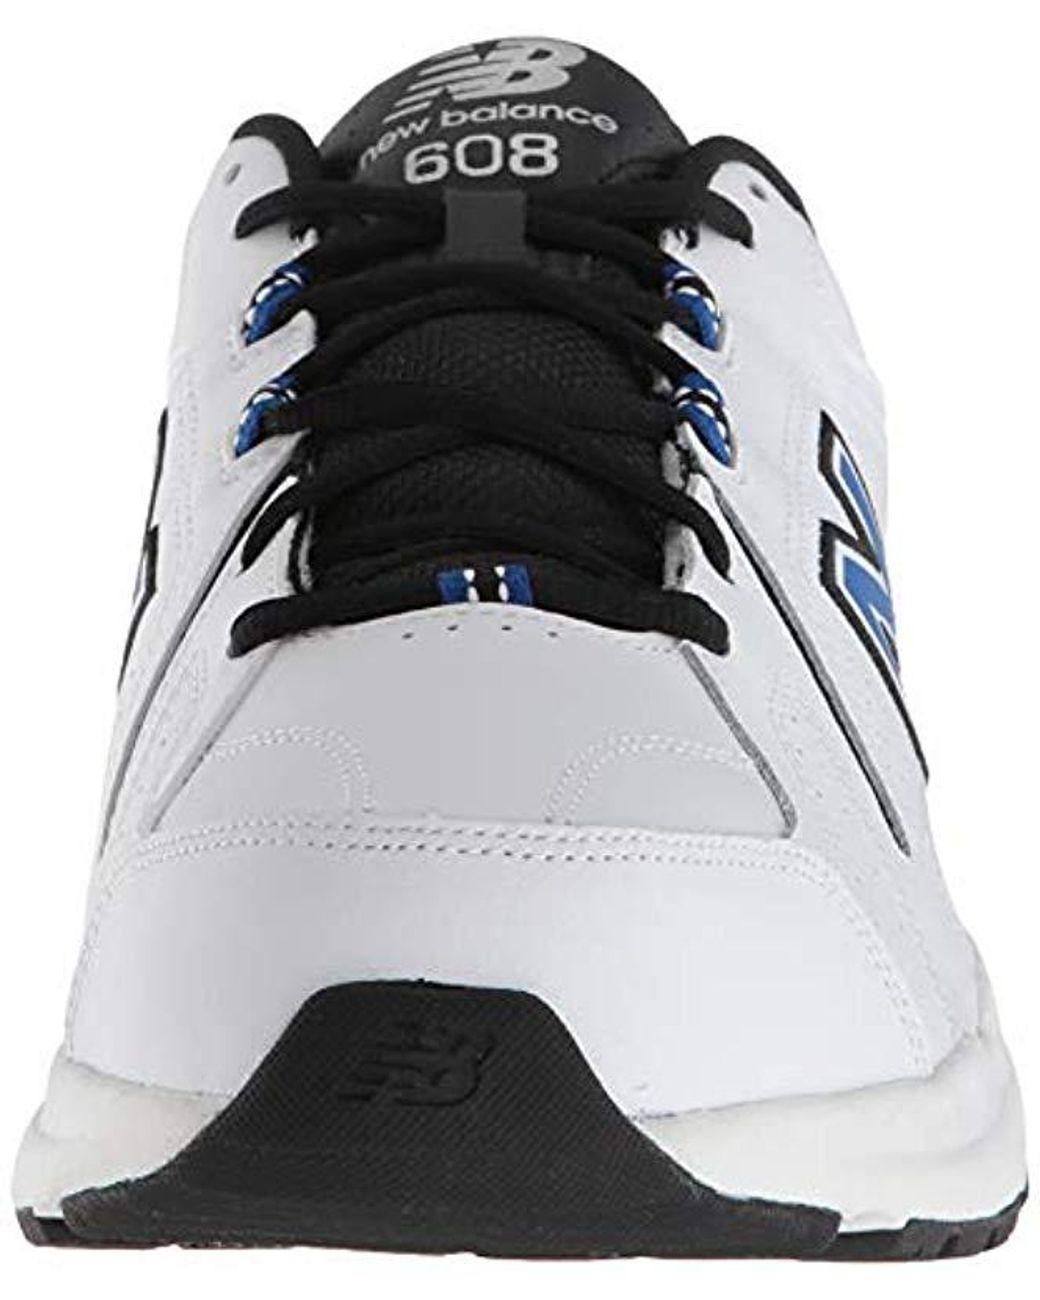 Men's Black 608v5 Casual Comfort Cross Sneaker Shoe